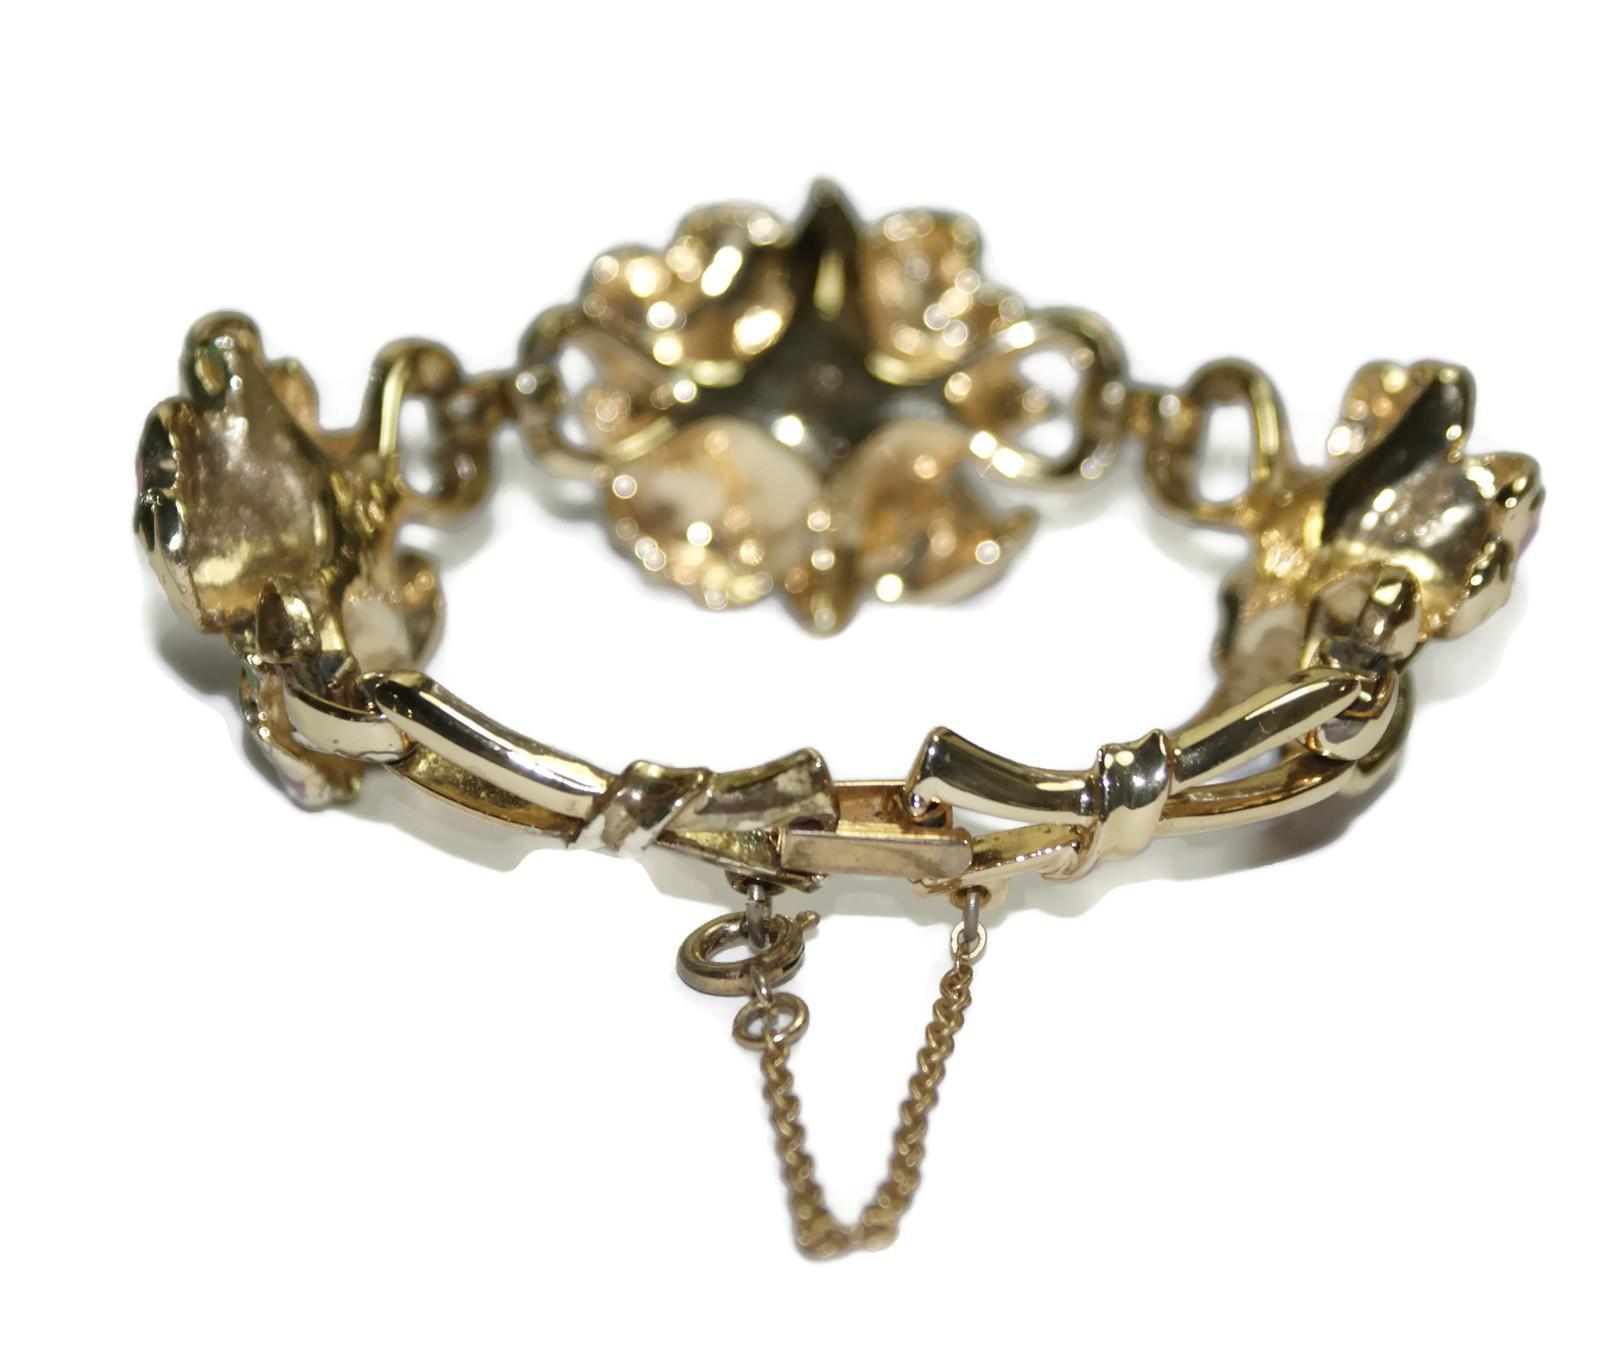 coro enamel rhinestone floral bracelet from luminousbijoux